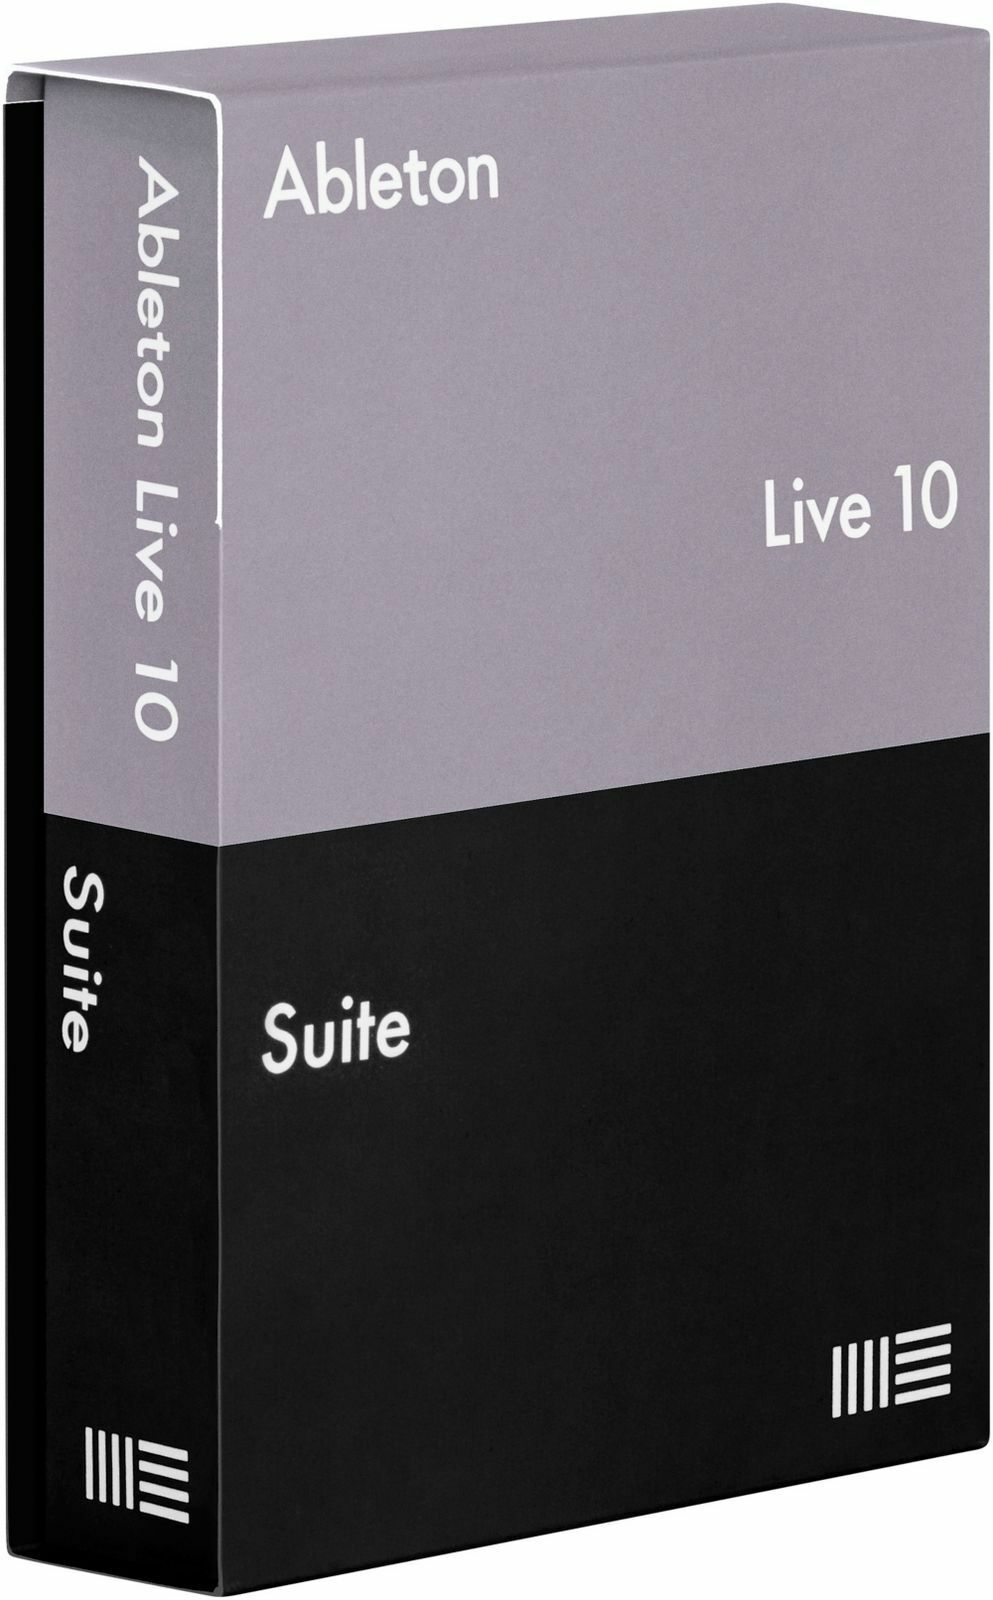 Free autotune for ableton live 10 | Auto  2019-03-01